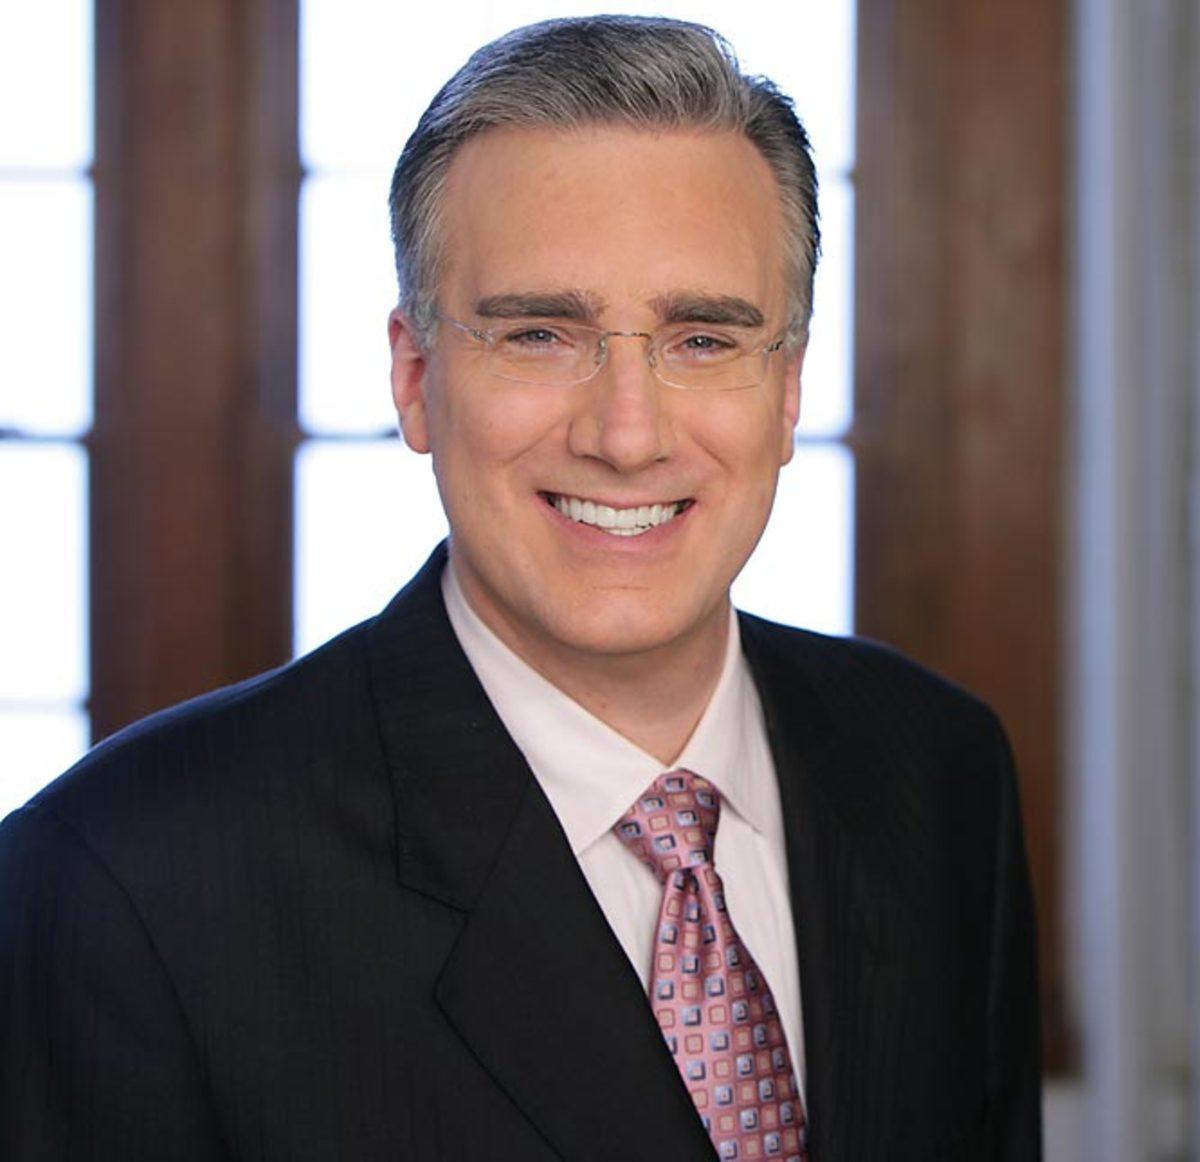 Keith Olbermann, MSNBC